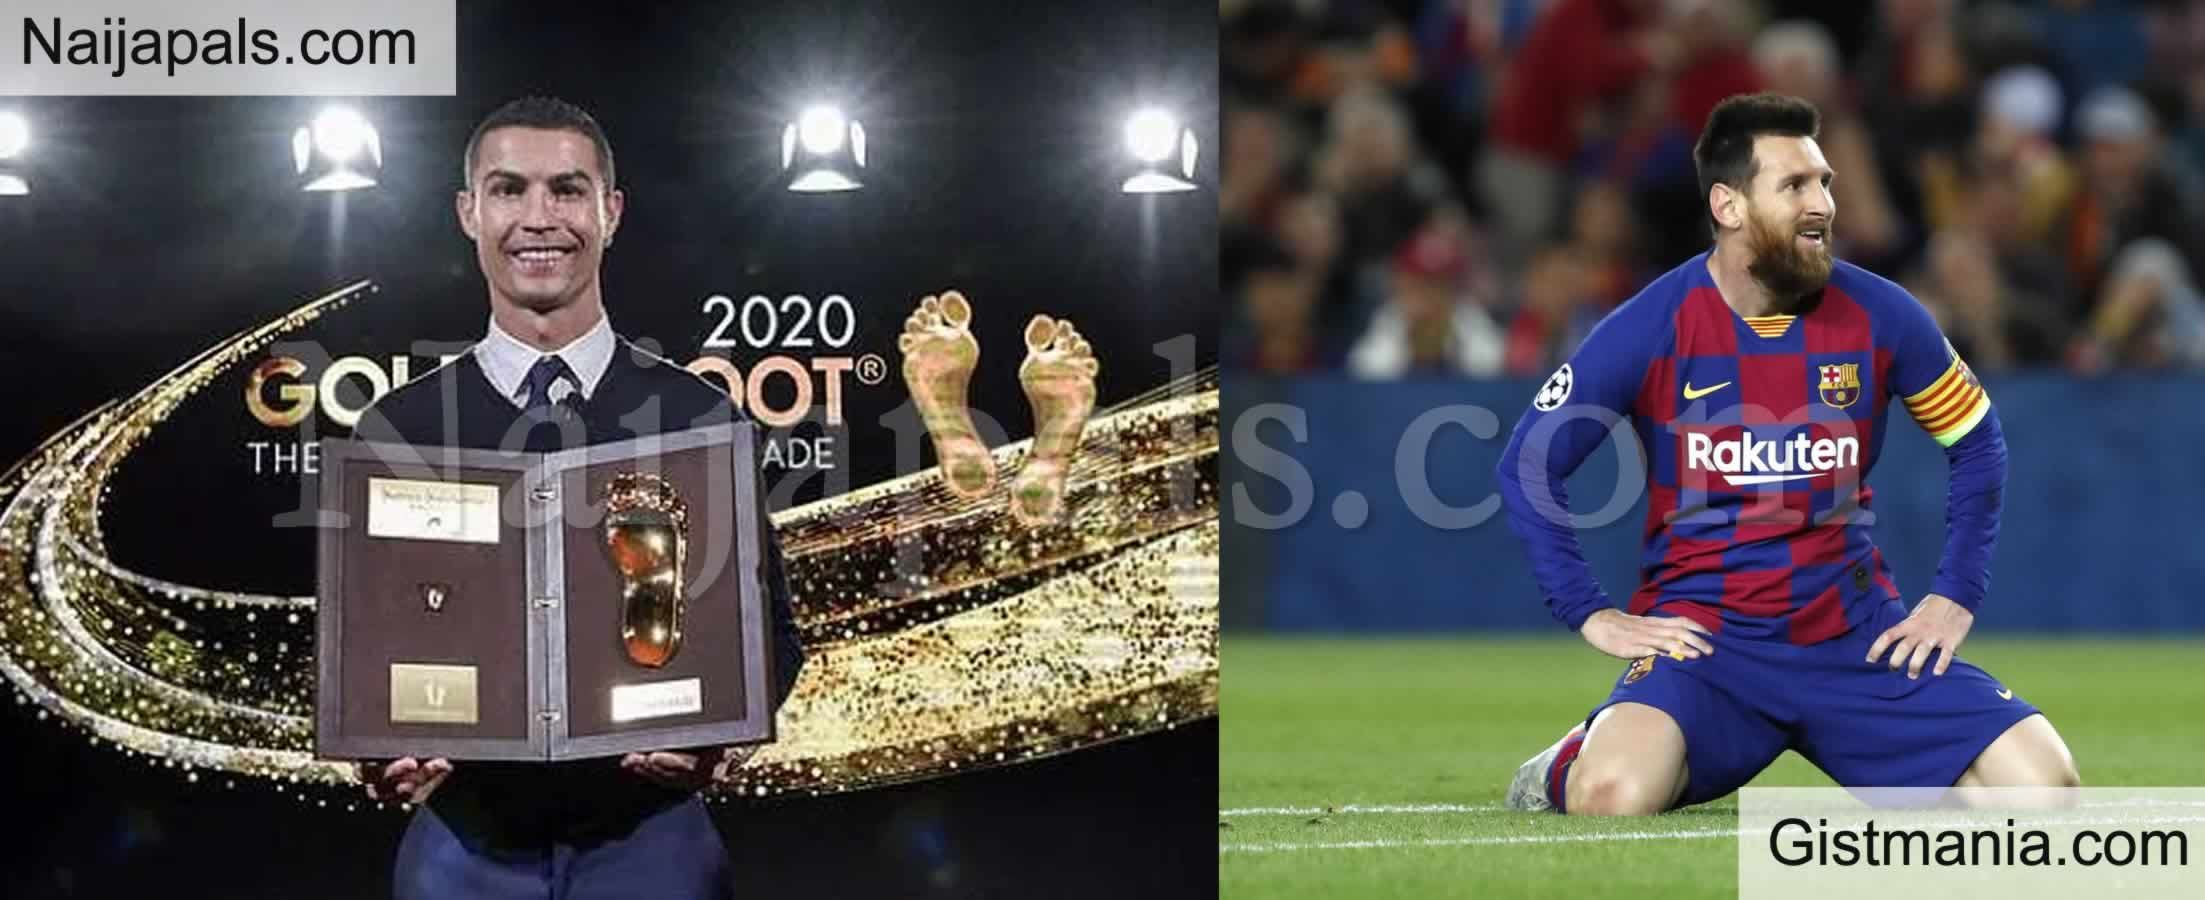 <img alt='.' class='lazyload' data-src='https://img.gistmania.com/emot/soccer.gif' /> <b>Ronaldo, Messi Eternal Rivalry Ignited As Juventus Confirm Barca Friendly</b>